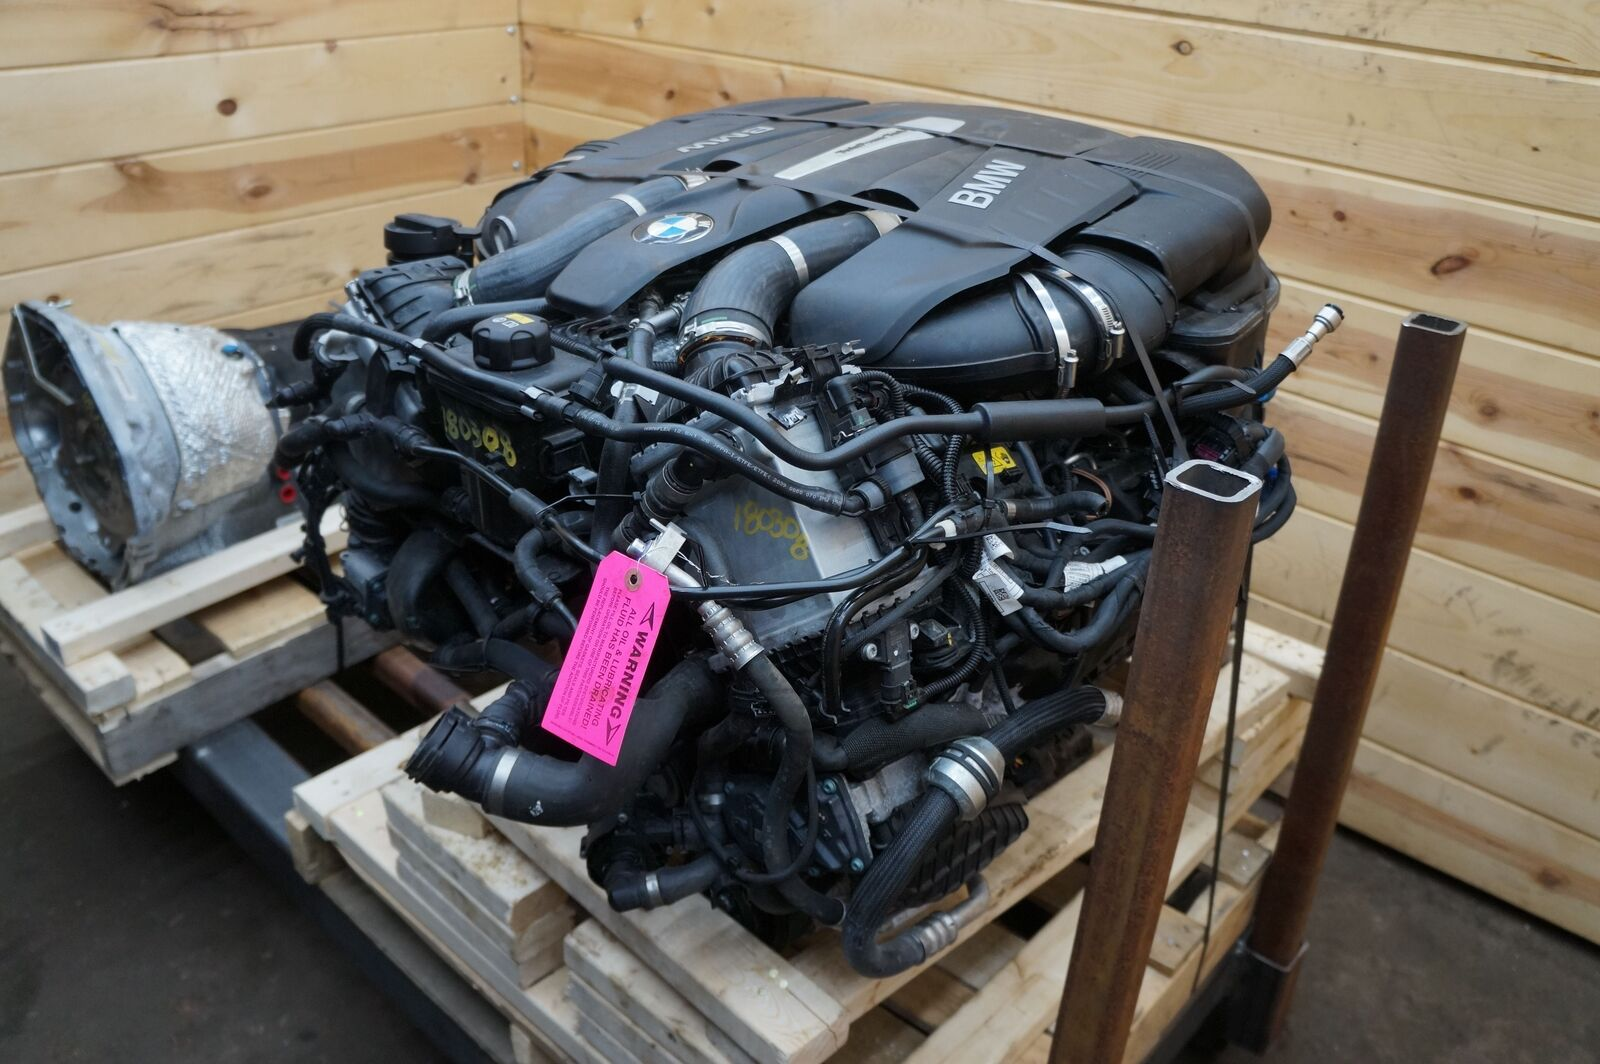 4 4l v8 twin turbo n63r engine dropout assembly bmw 750. Black Bedroom Furniture Sets. Home Design Ideas